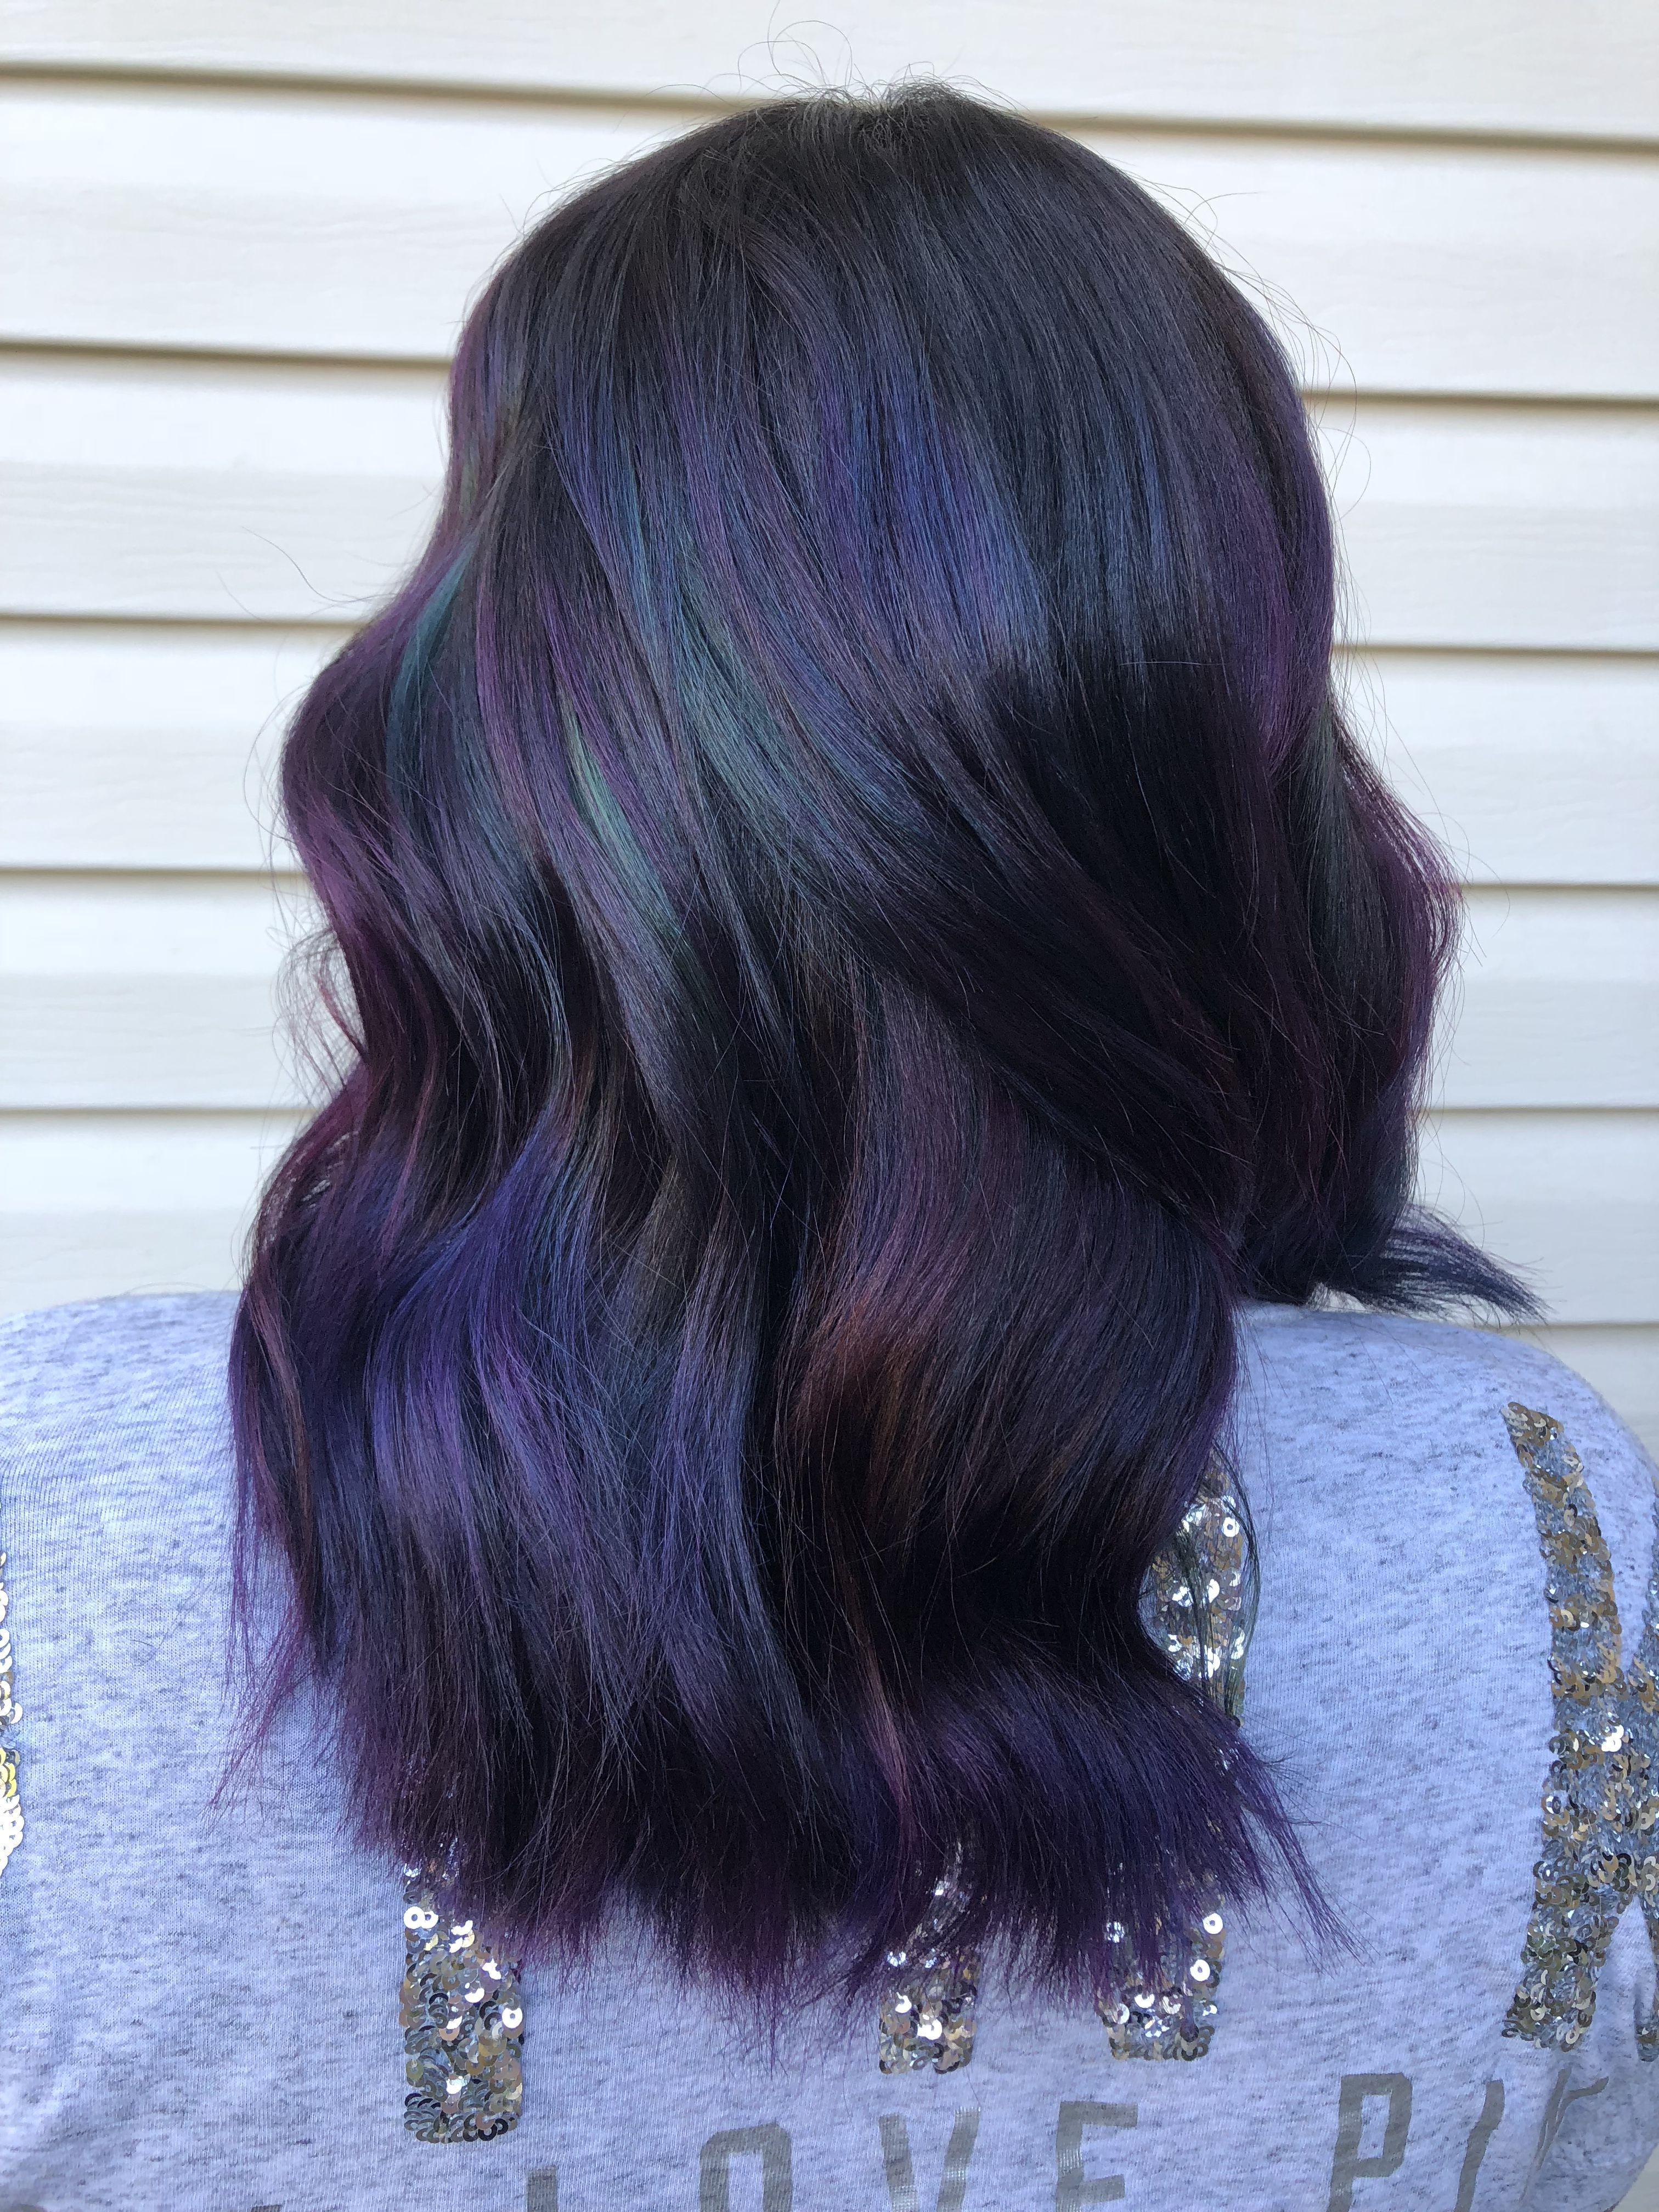 Joico Intensity Balayage Purple Blue Green Pink Hair Curls Waves